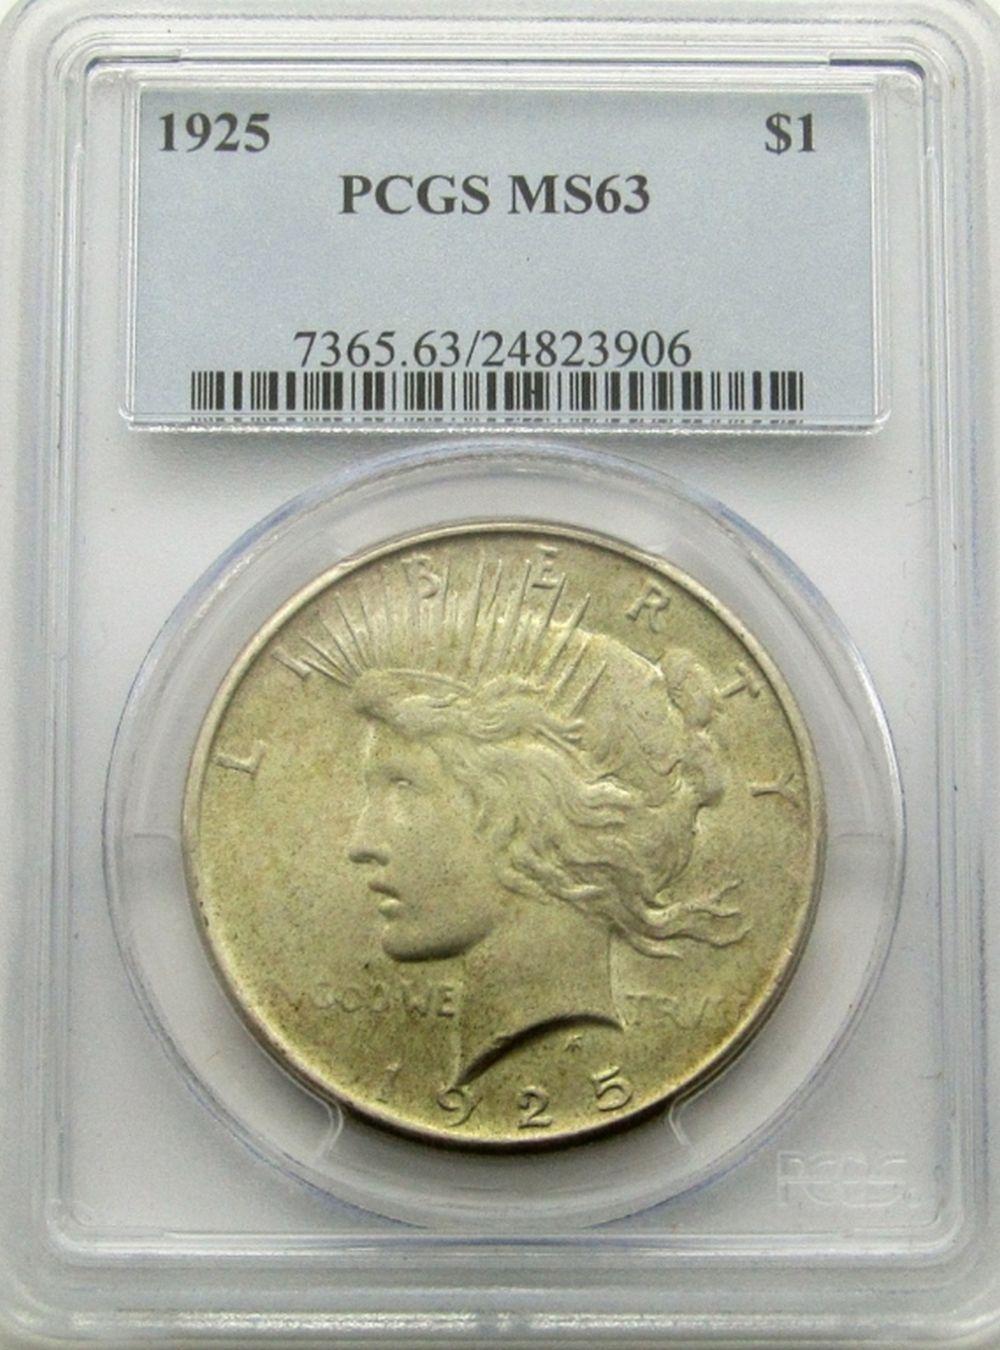 1925 PEACE DOLLAR PCGS MS63